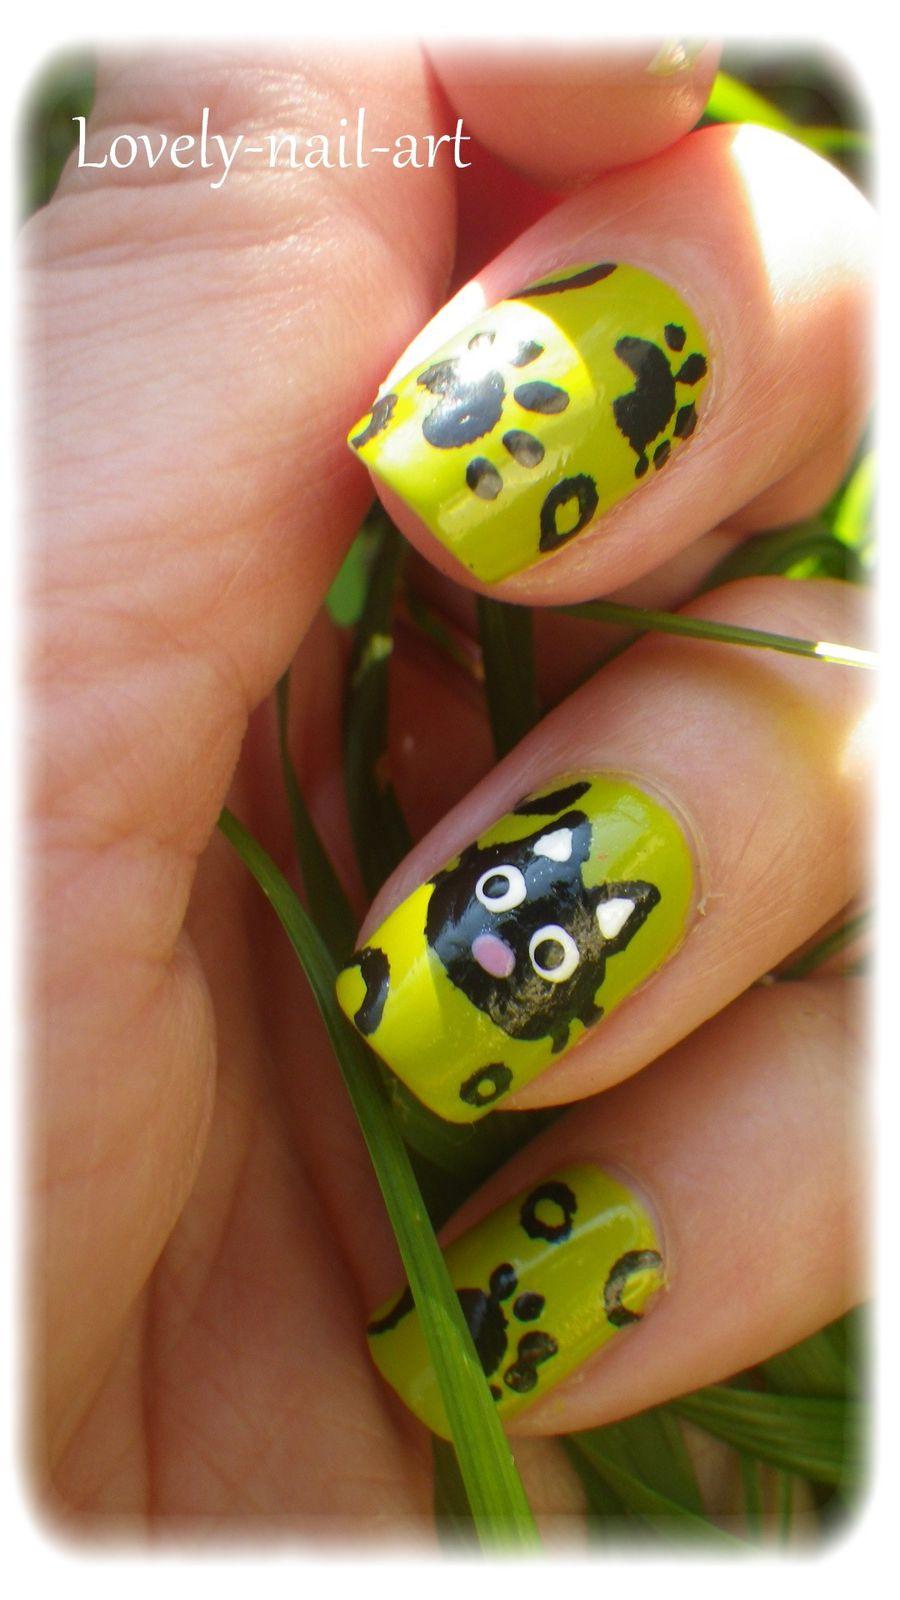 Miaouuu le blog de lovely nail art - Nail art chat ...